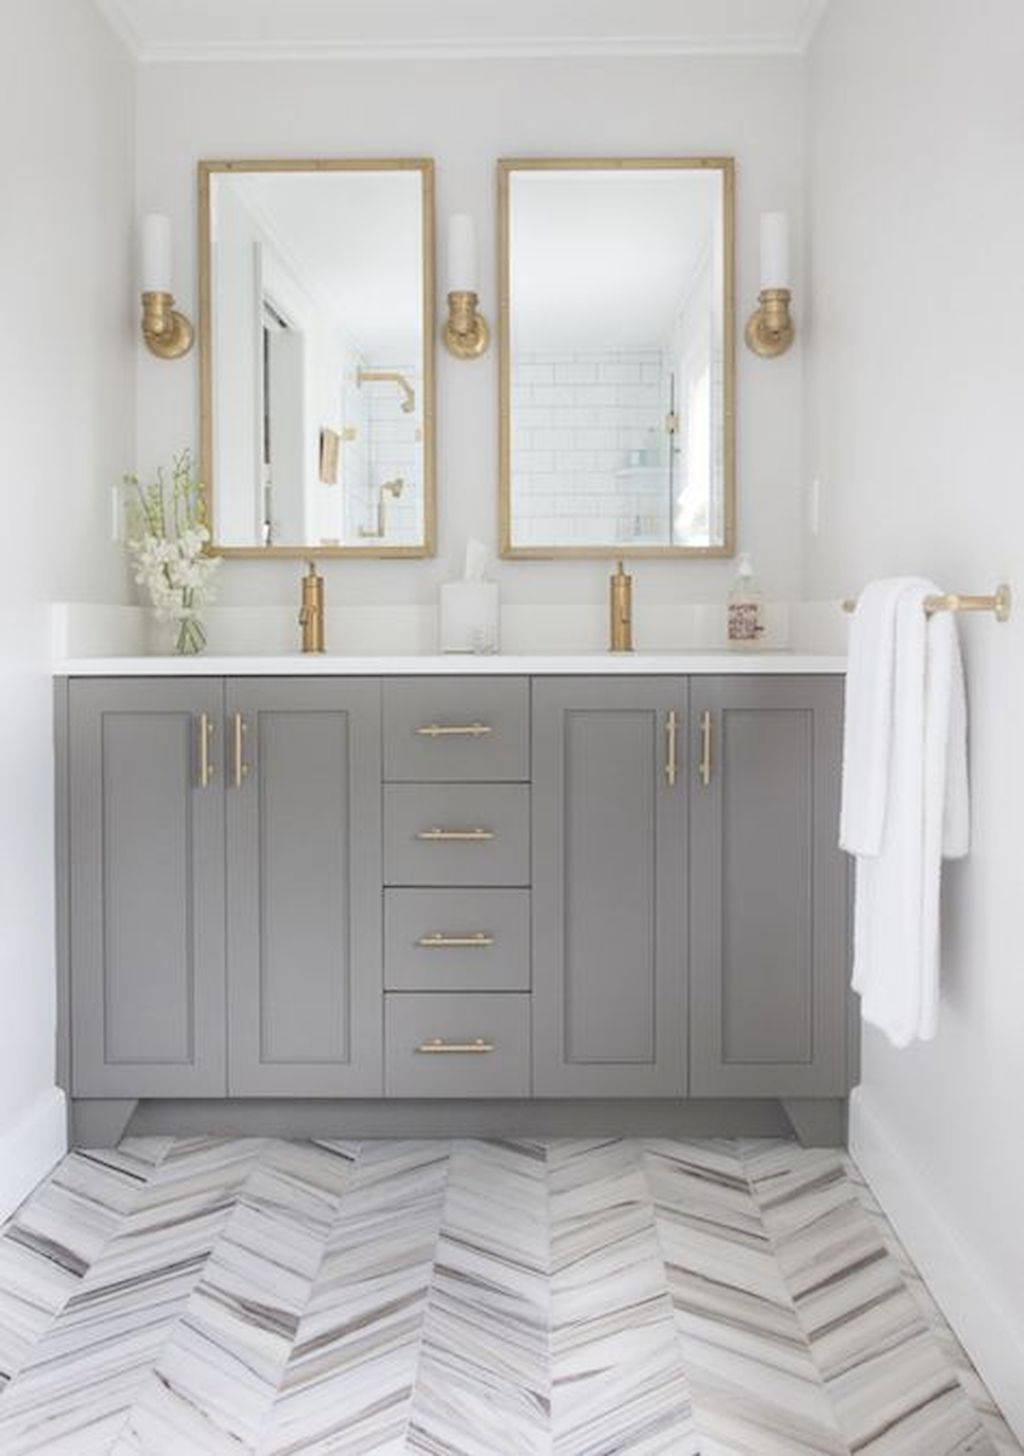 58 Gorgeous White Kitchen Cabinet Design Ideas | Trending Decoration ...